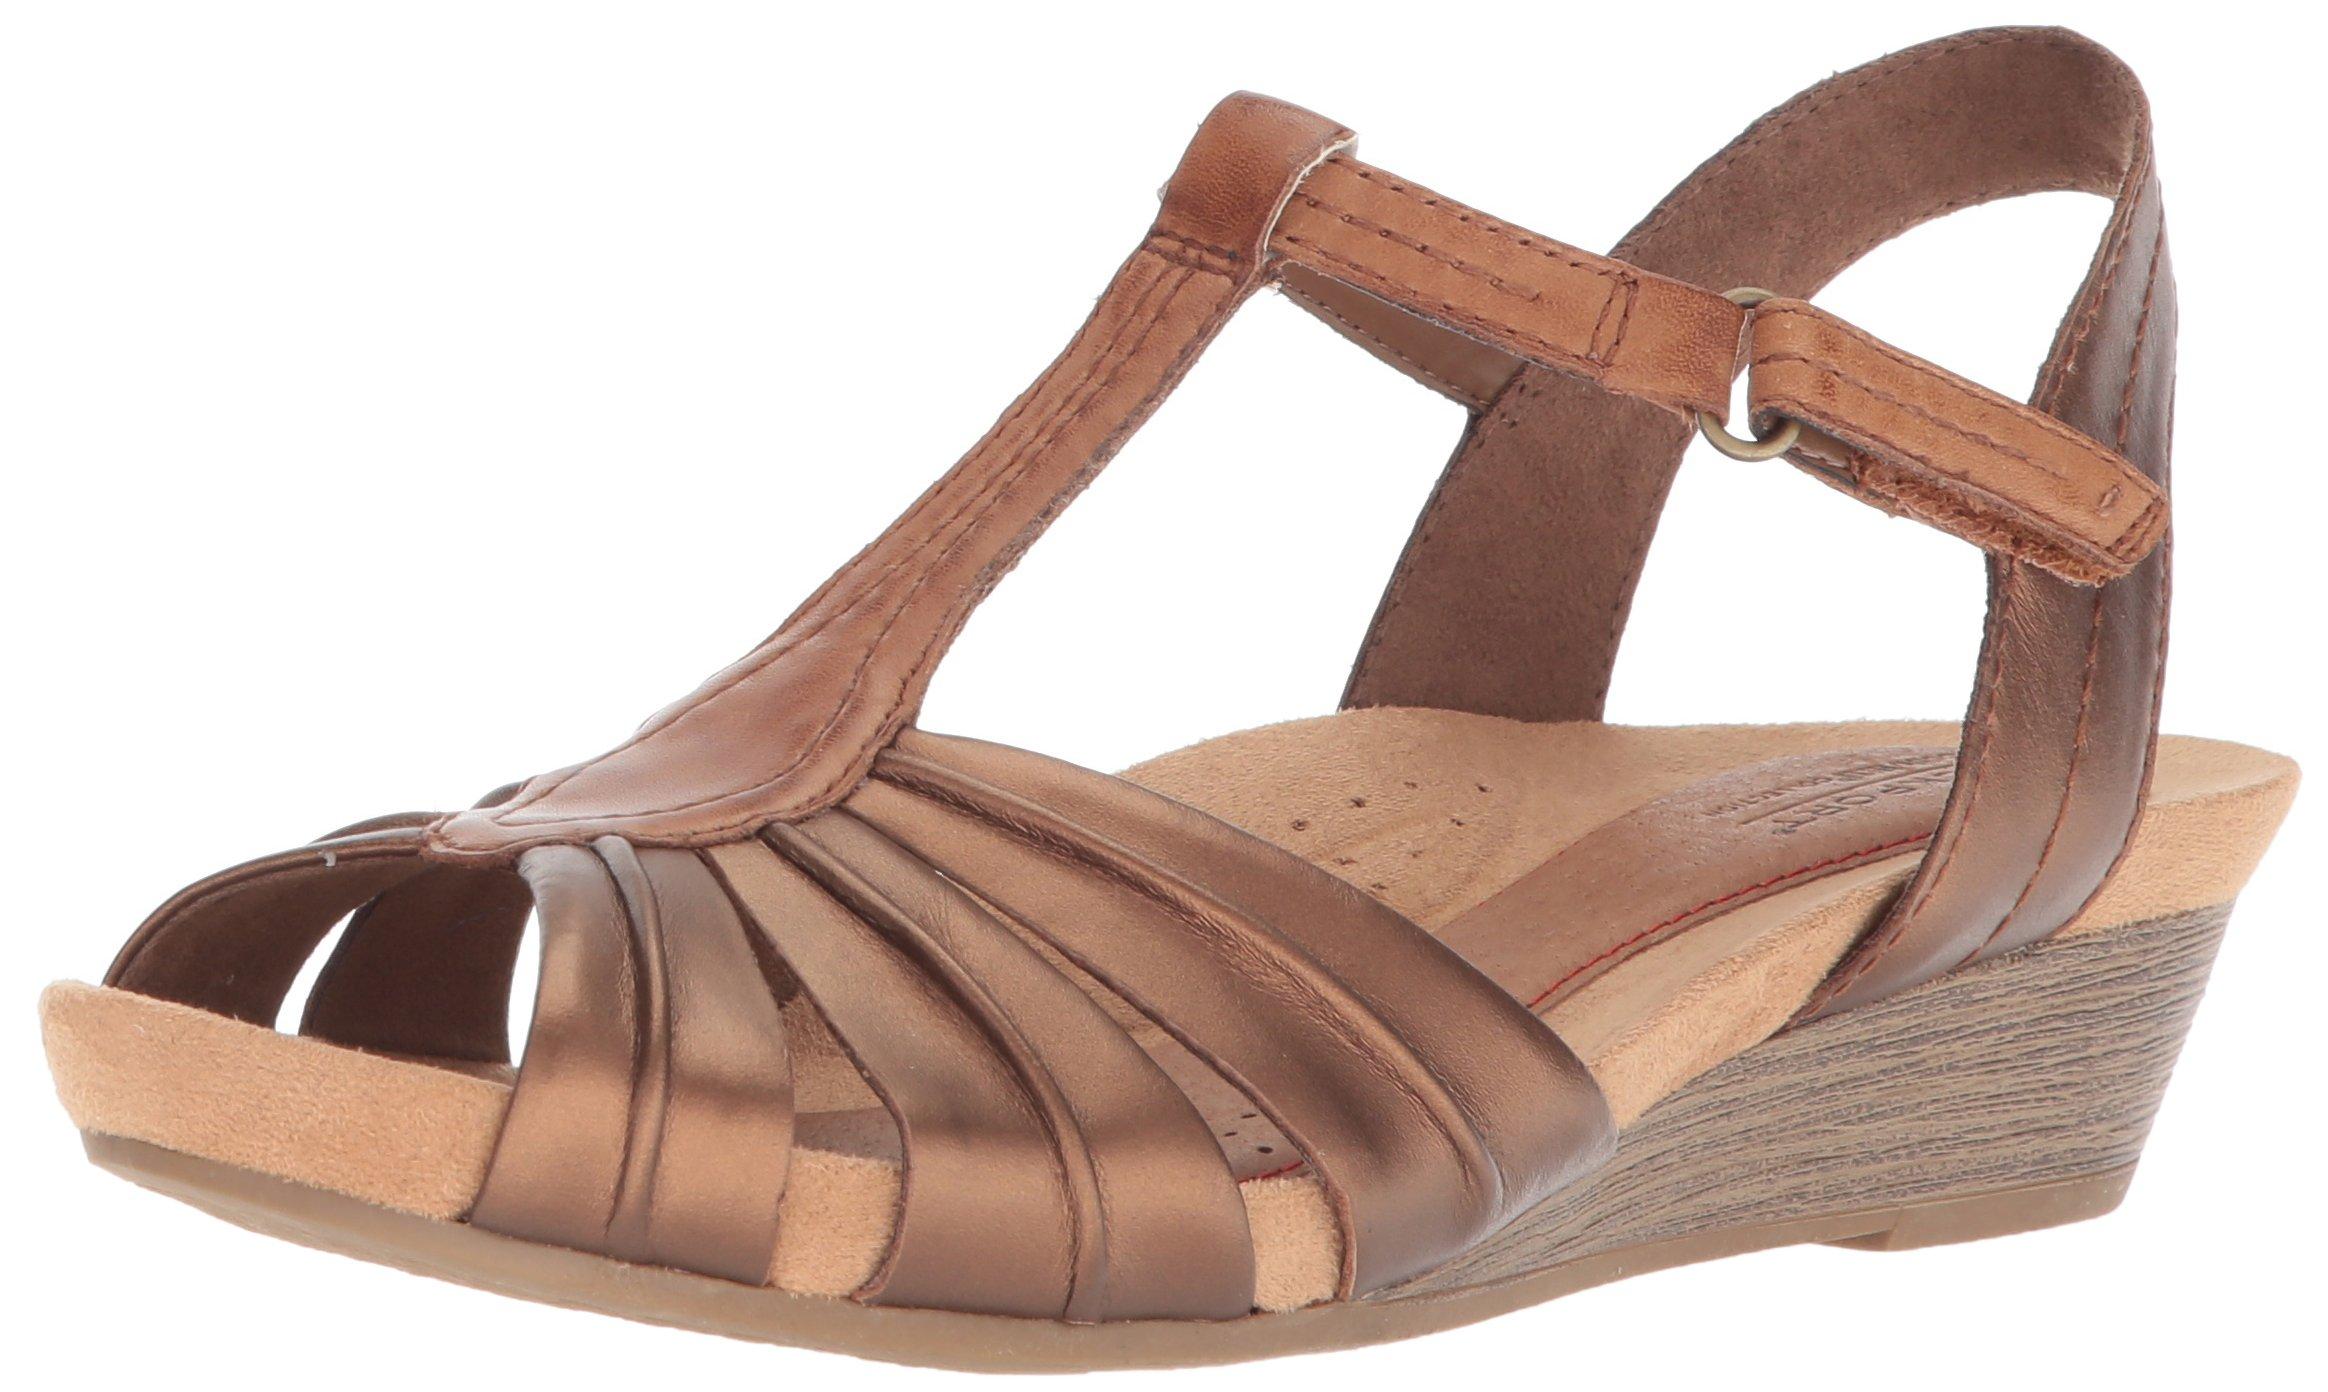 Cobb Hill Women's Hollywood Pleat T Sandal, Bronze, 7.5 M US